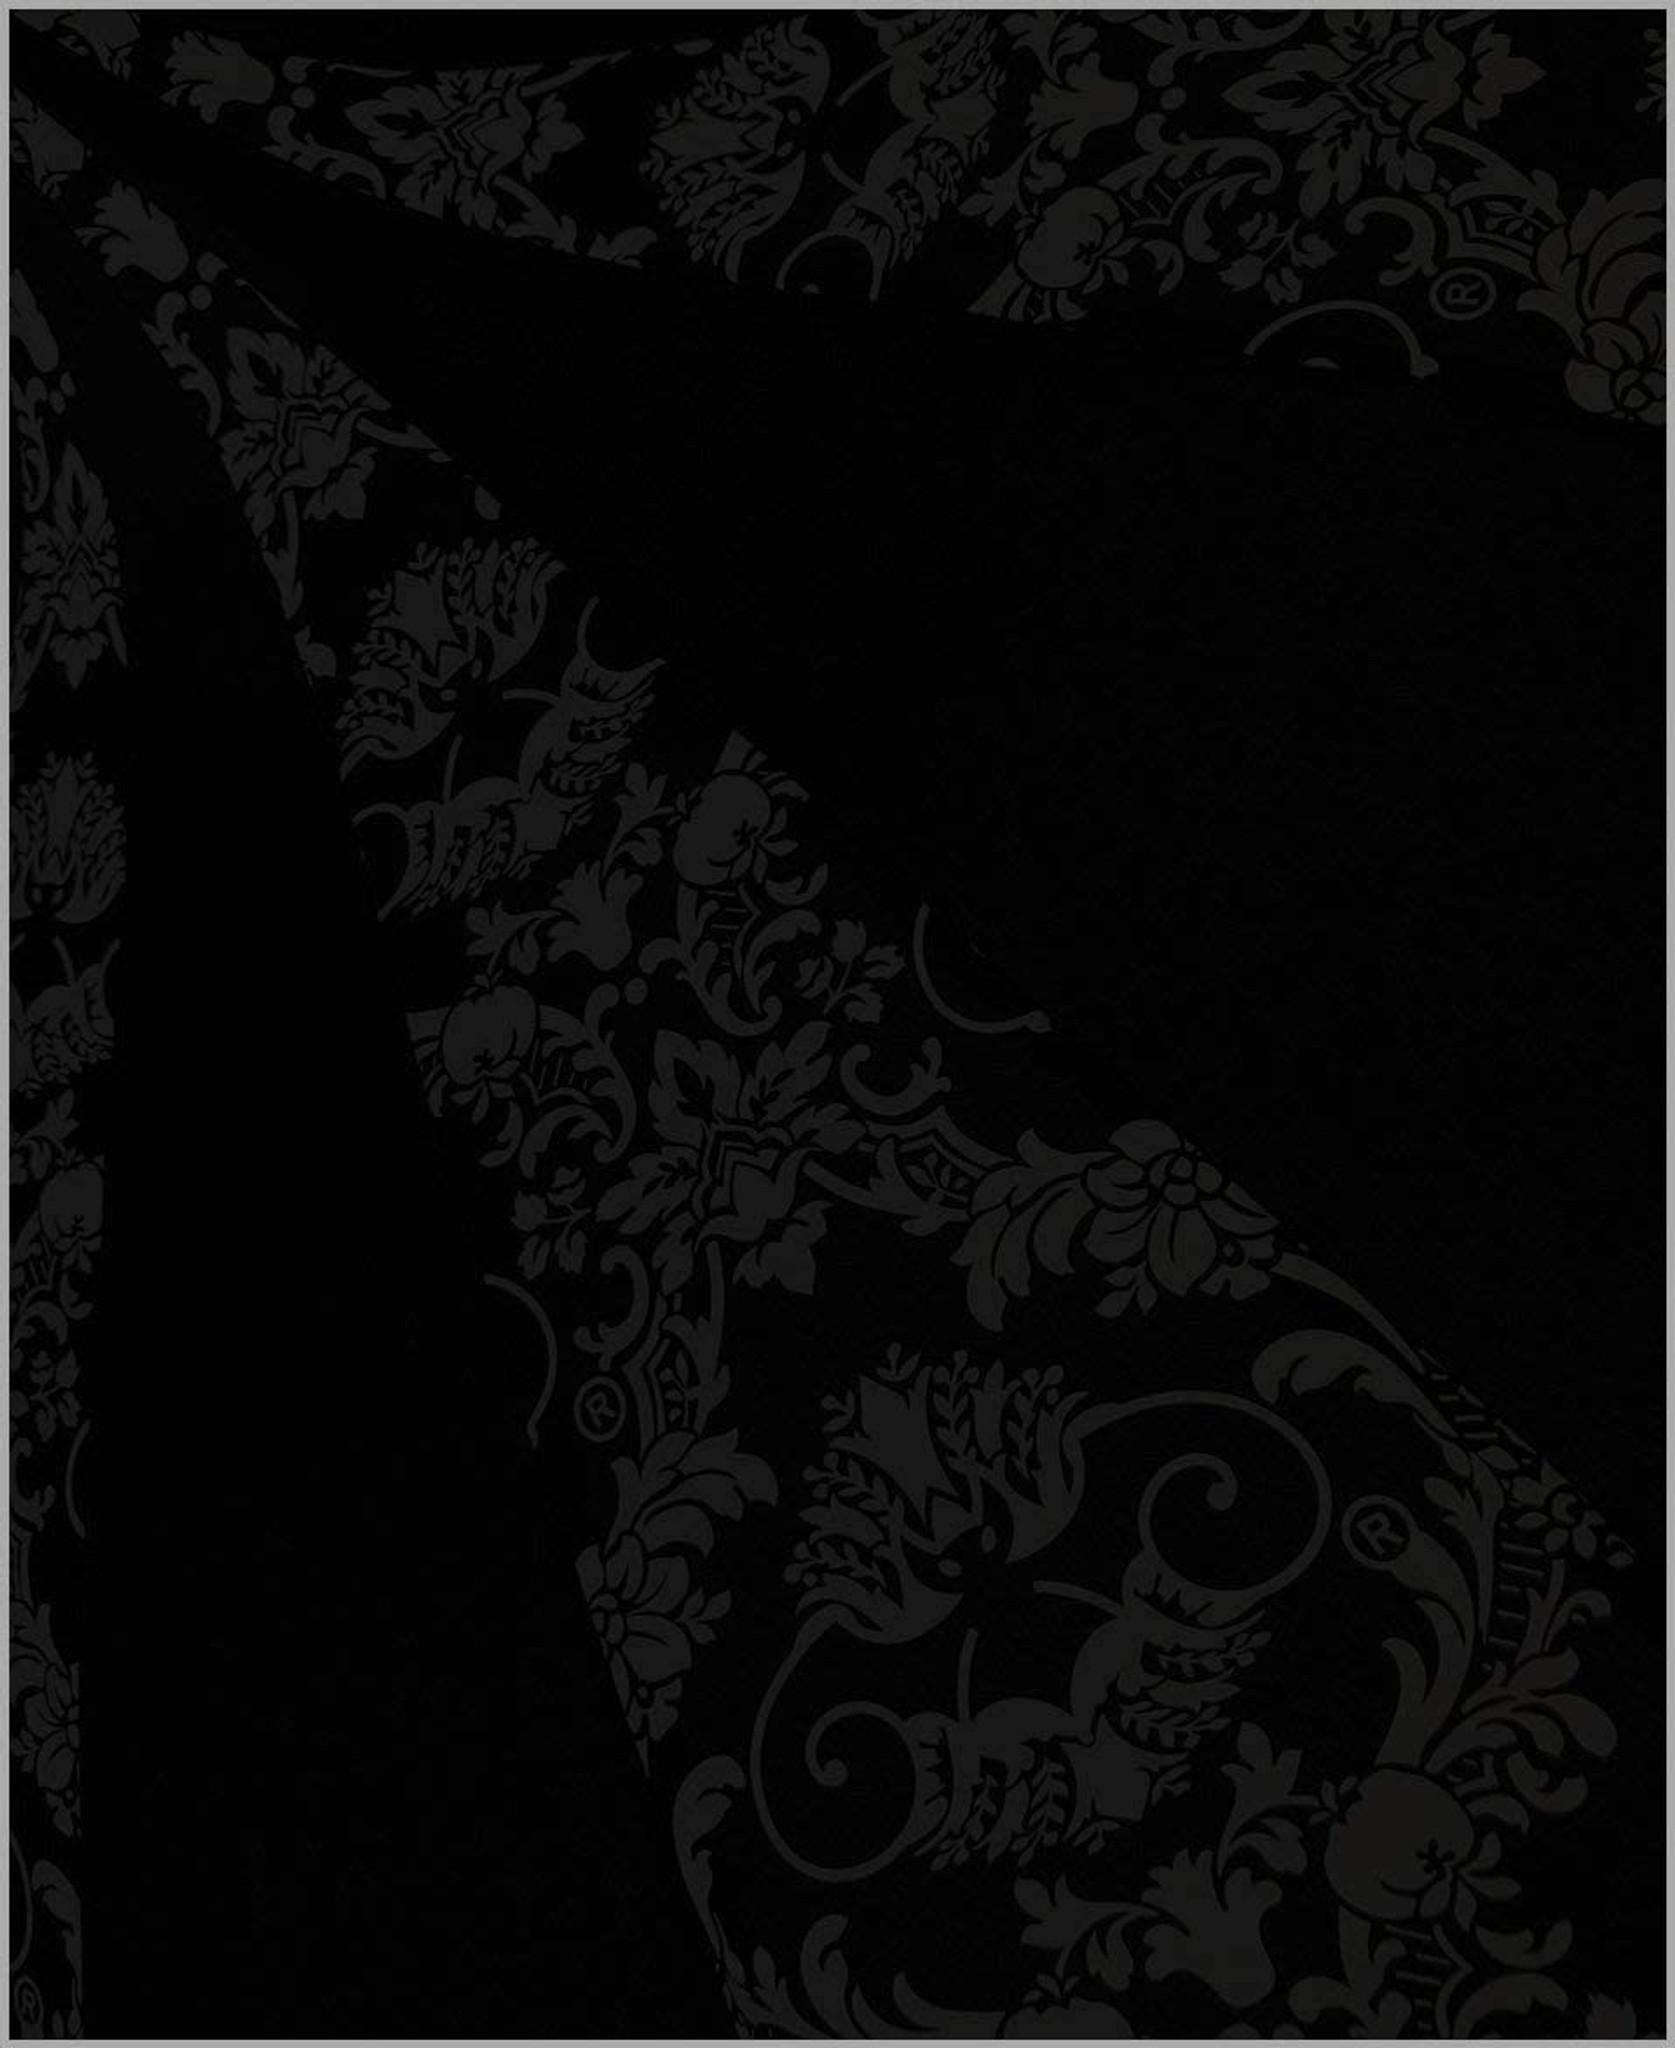 Close up of black bat damask print on black umbrella/parasol.